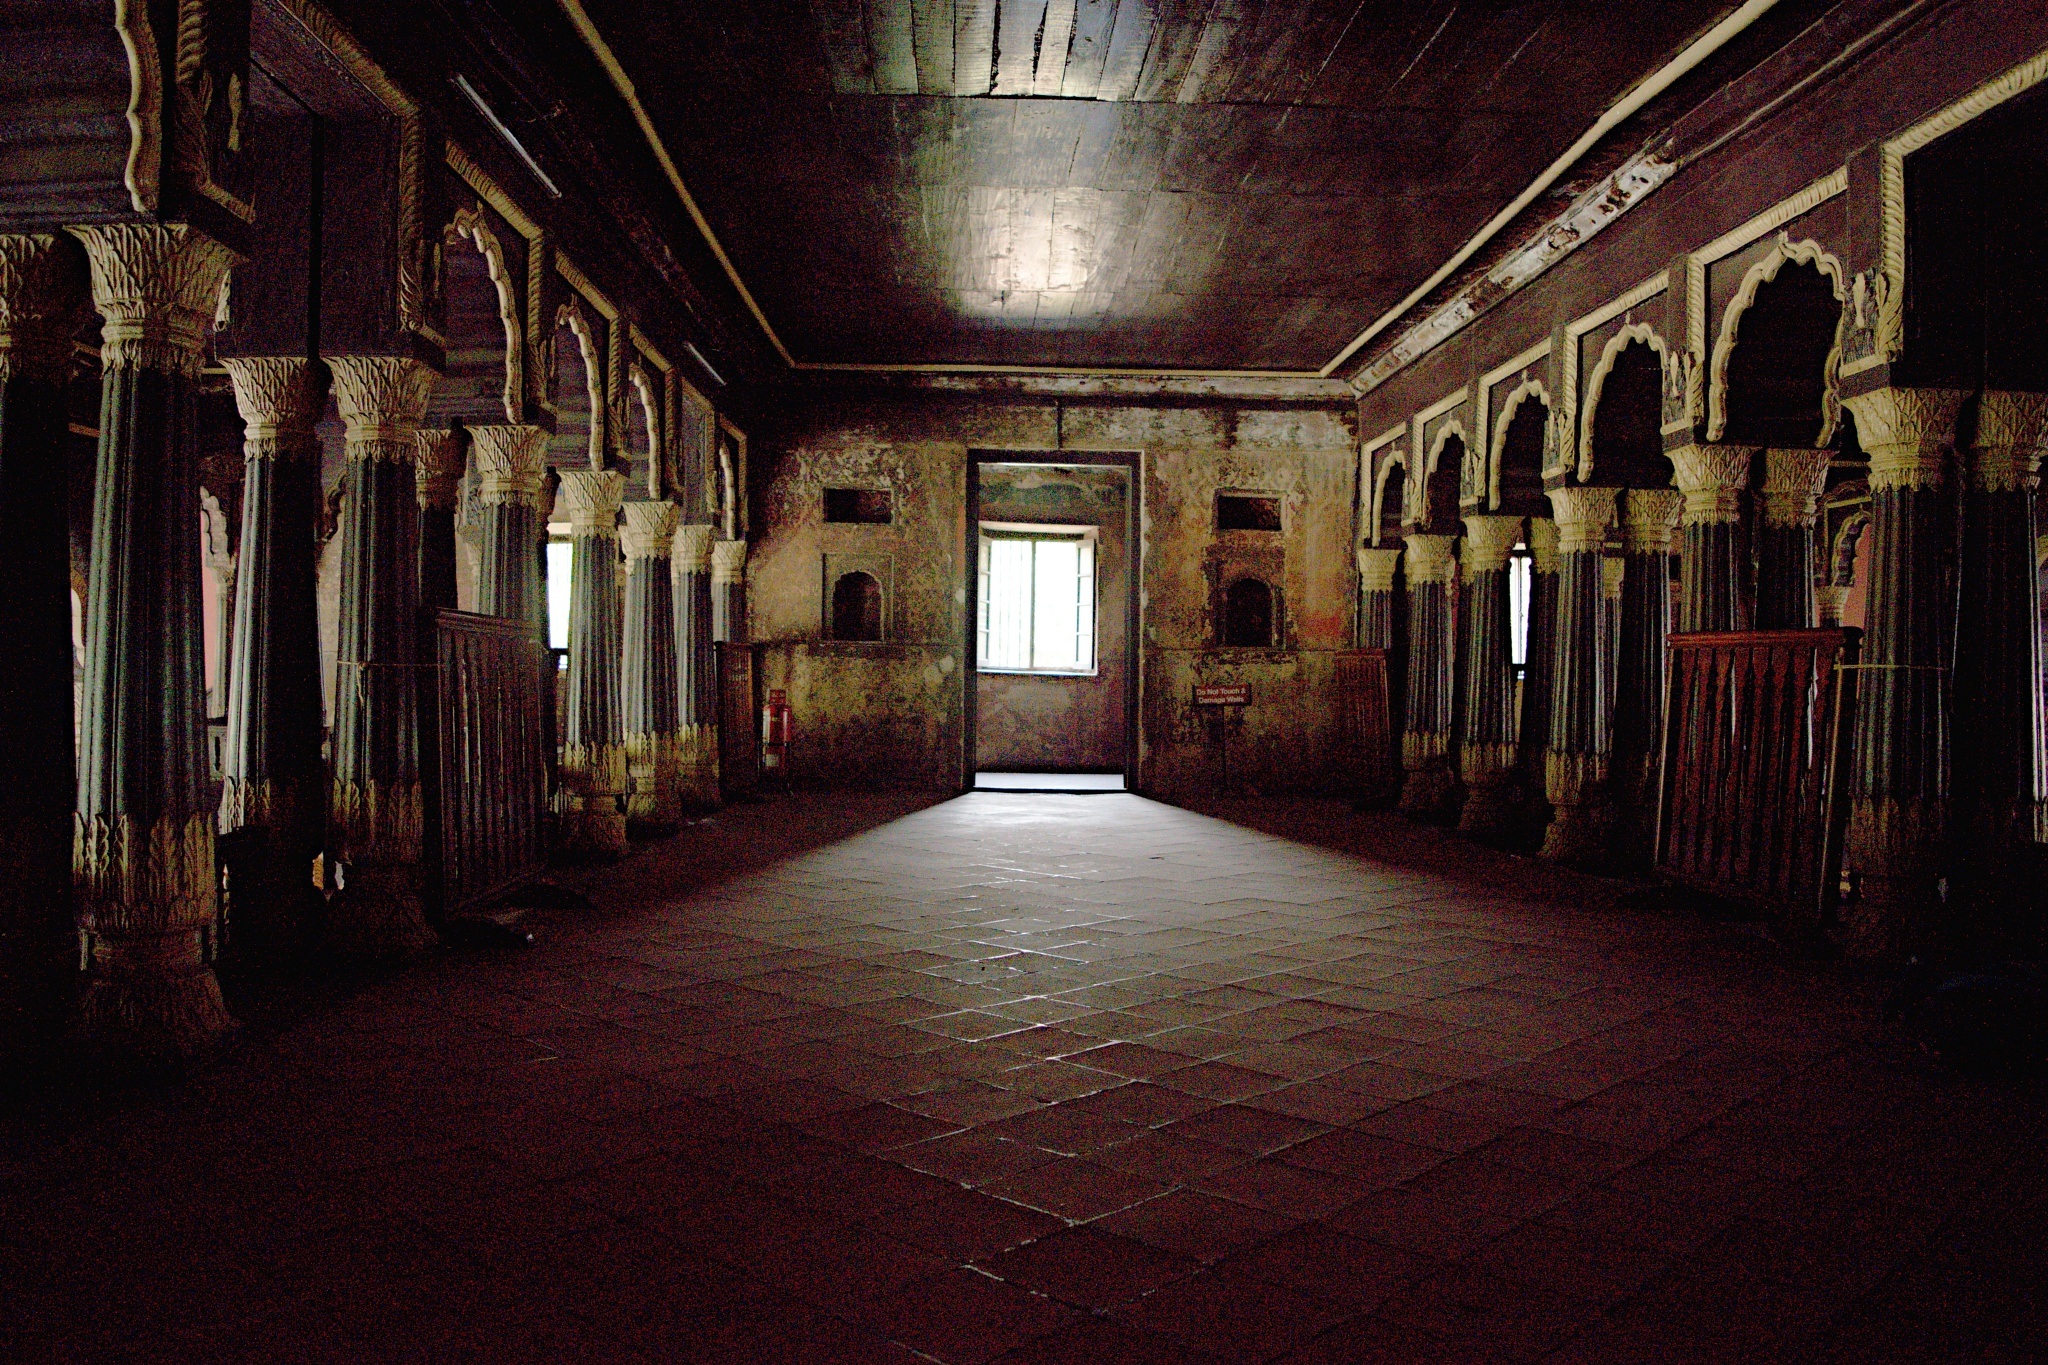 Tipu Sultan's Palace by Radhamadhavan K S